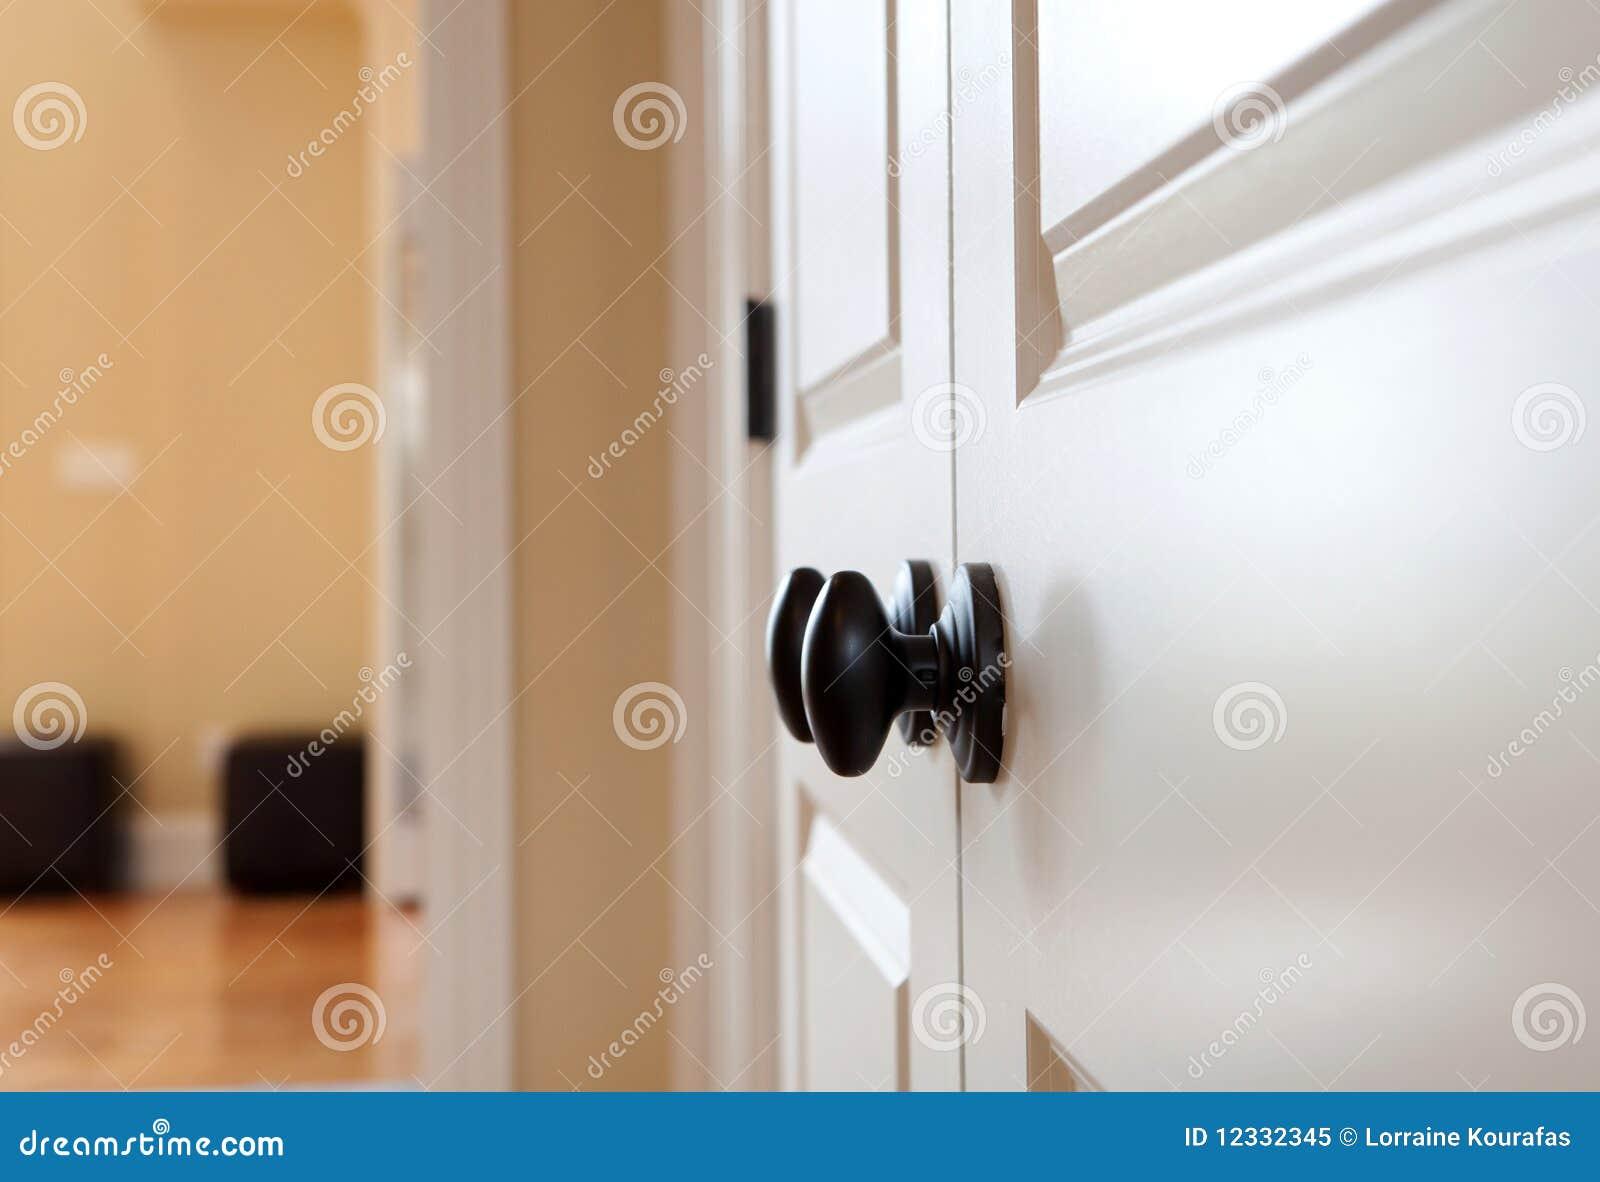 Black Door Knob Royalty Free Stock Photo Image 12332345